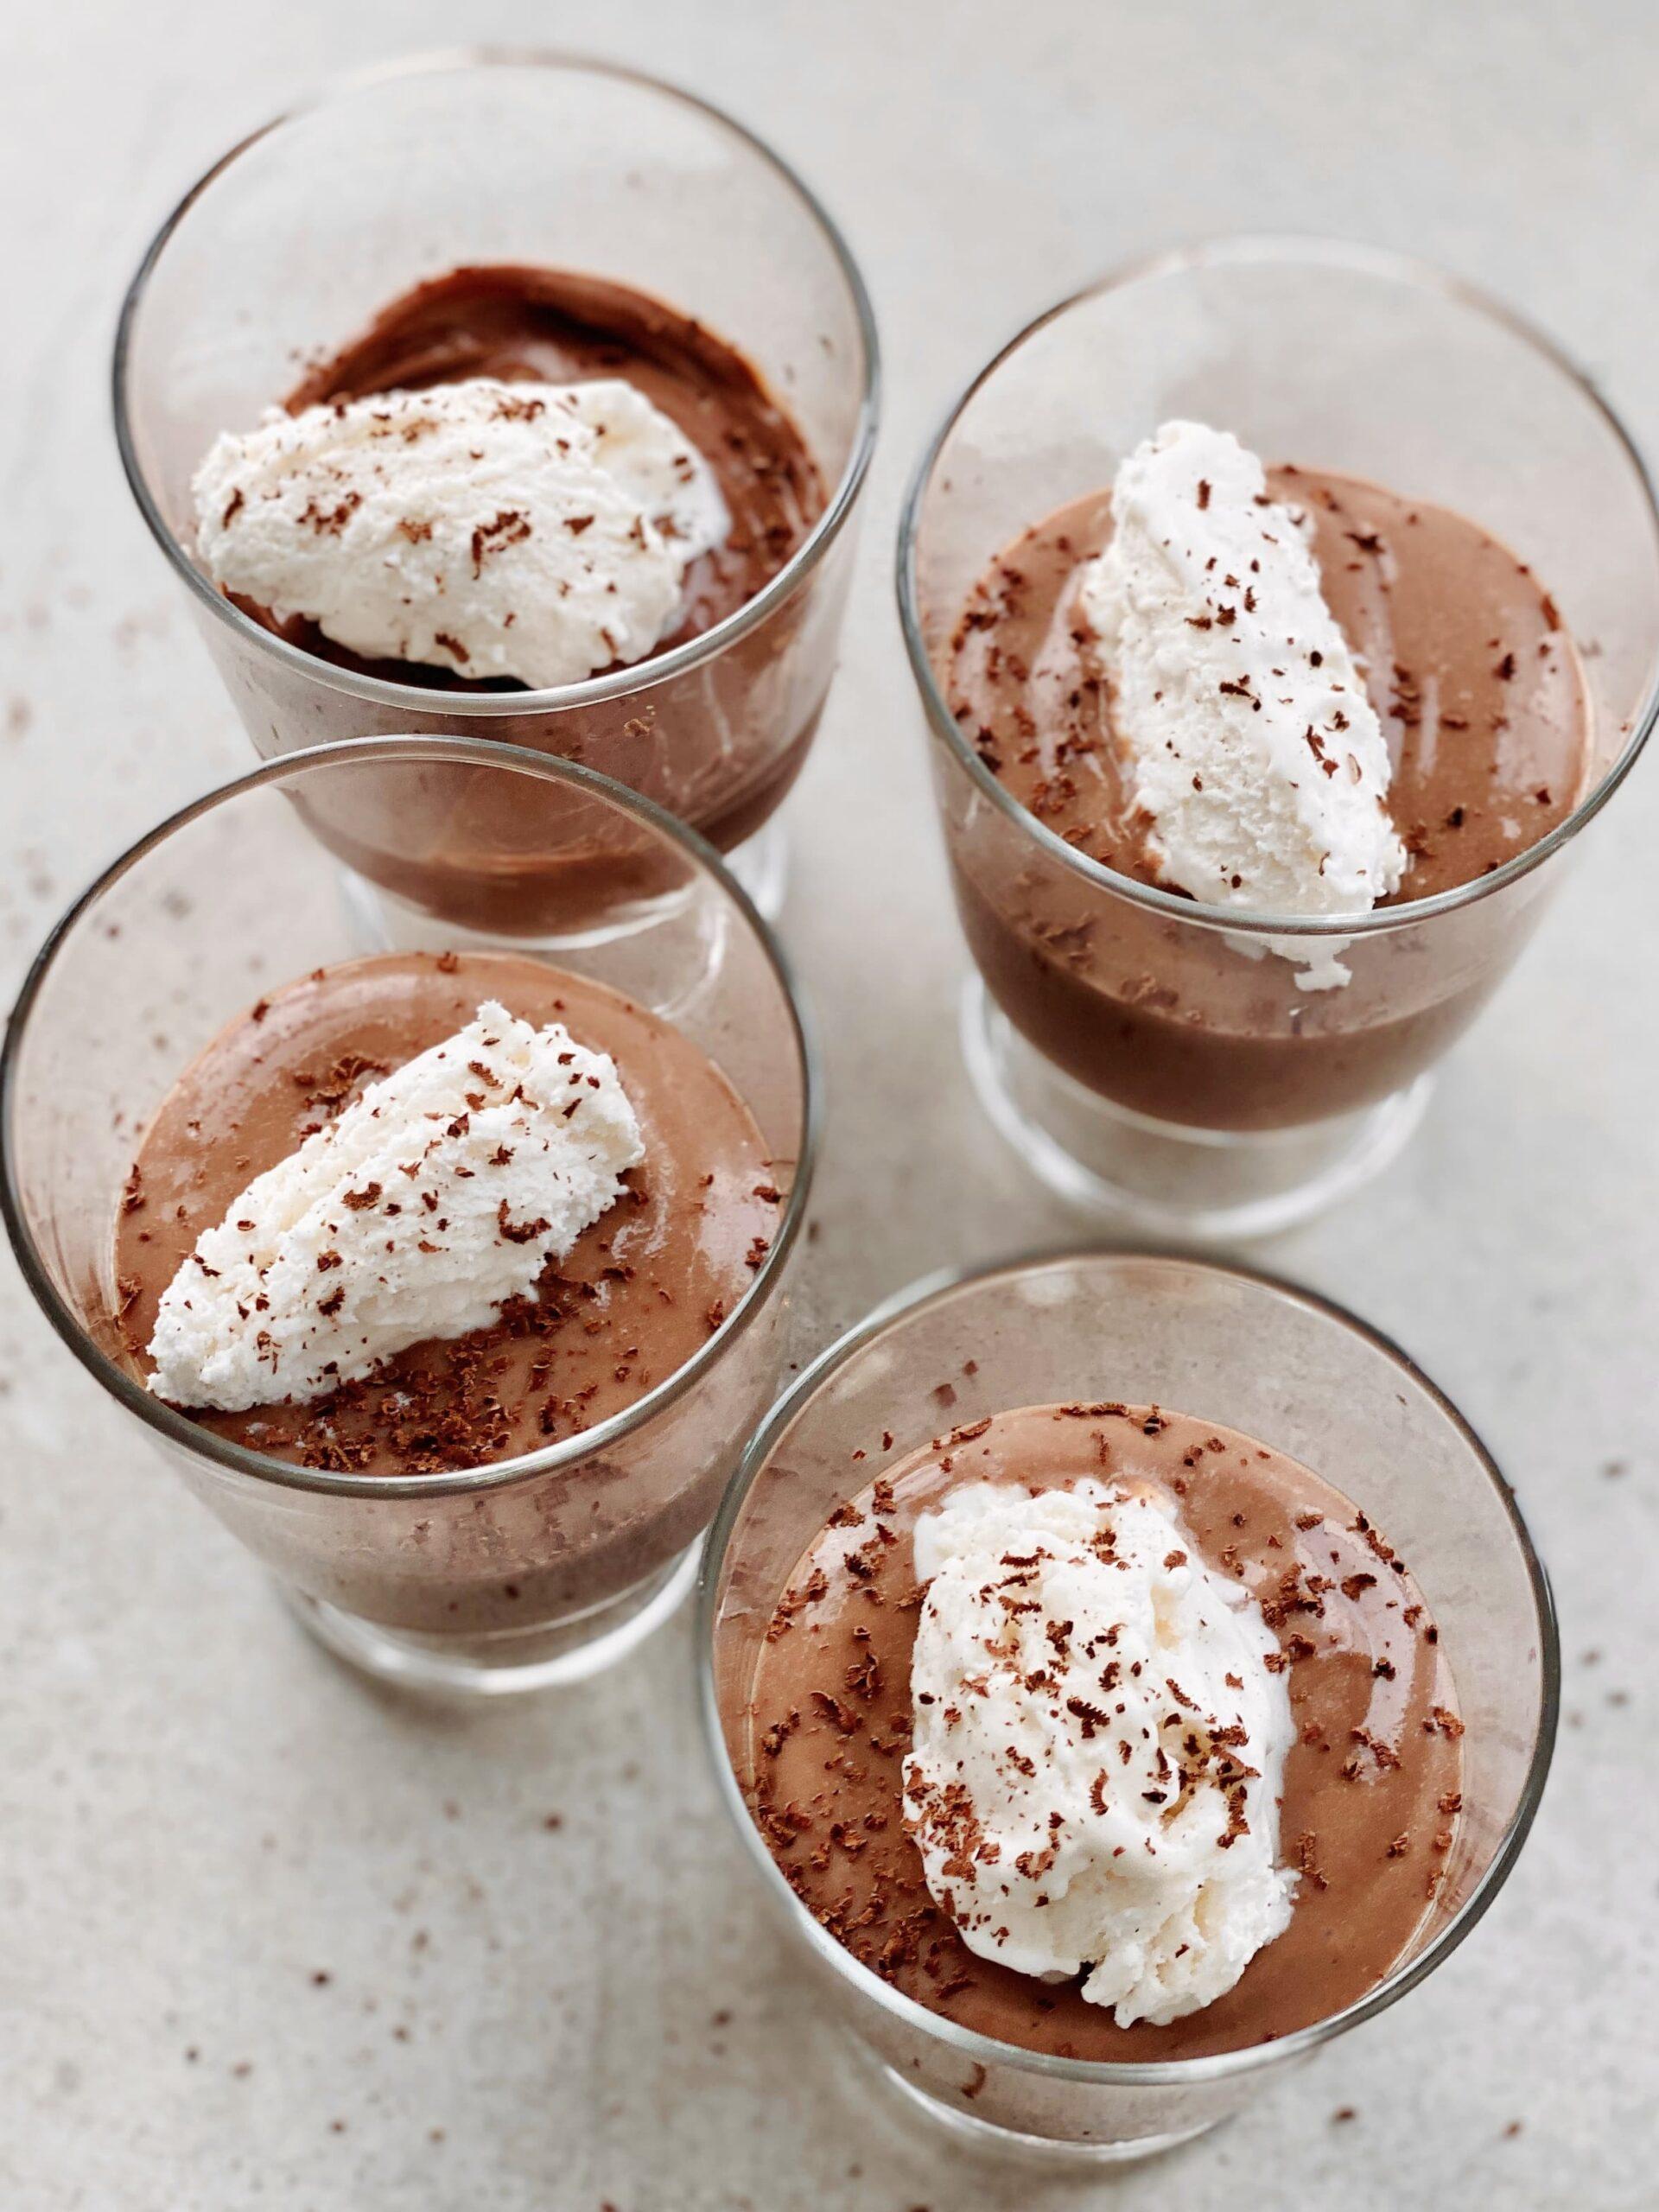 Tofu Chocolate Pudding With  Vegan Whipped Cream